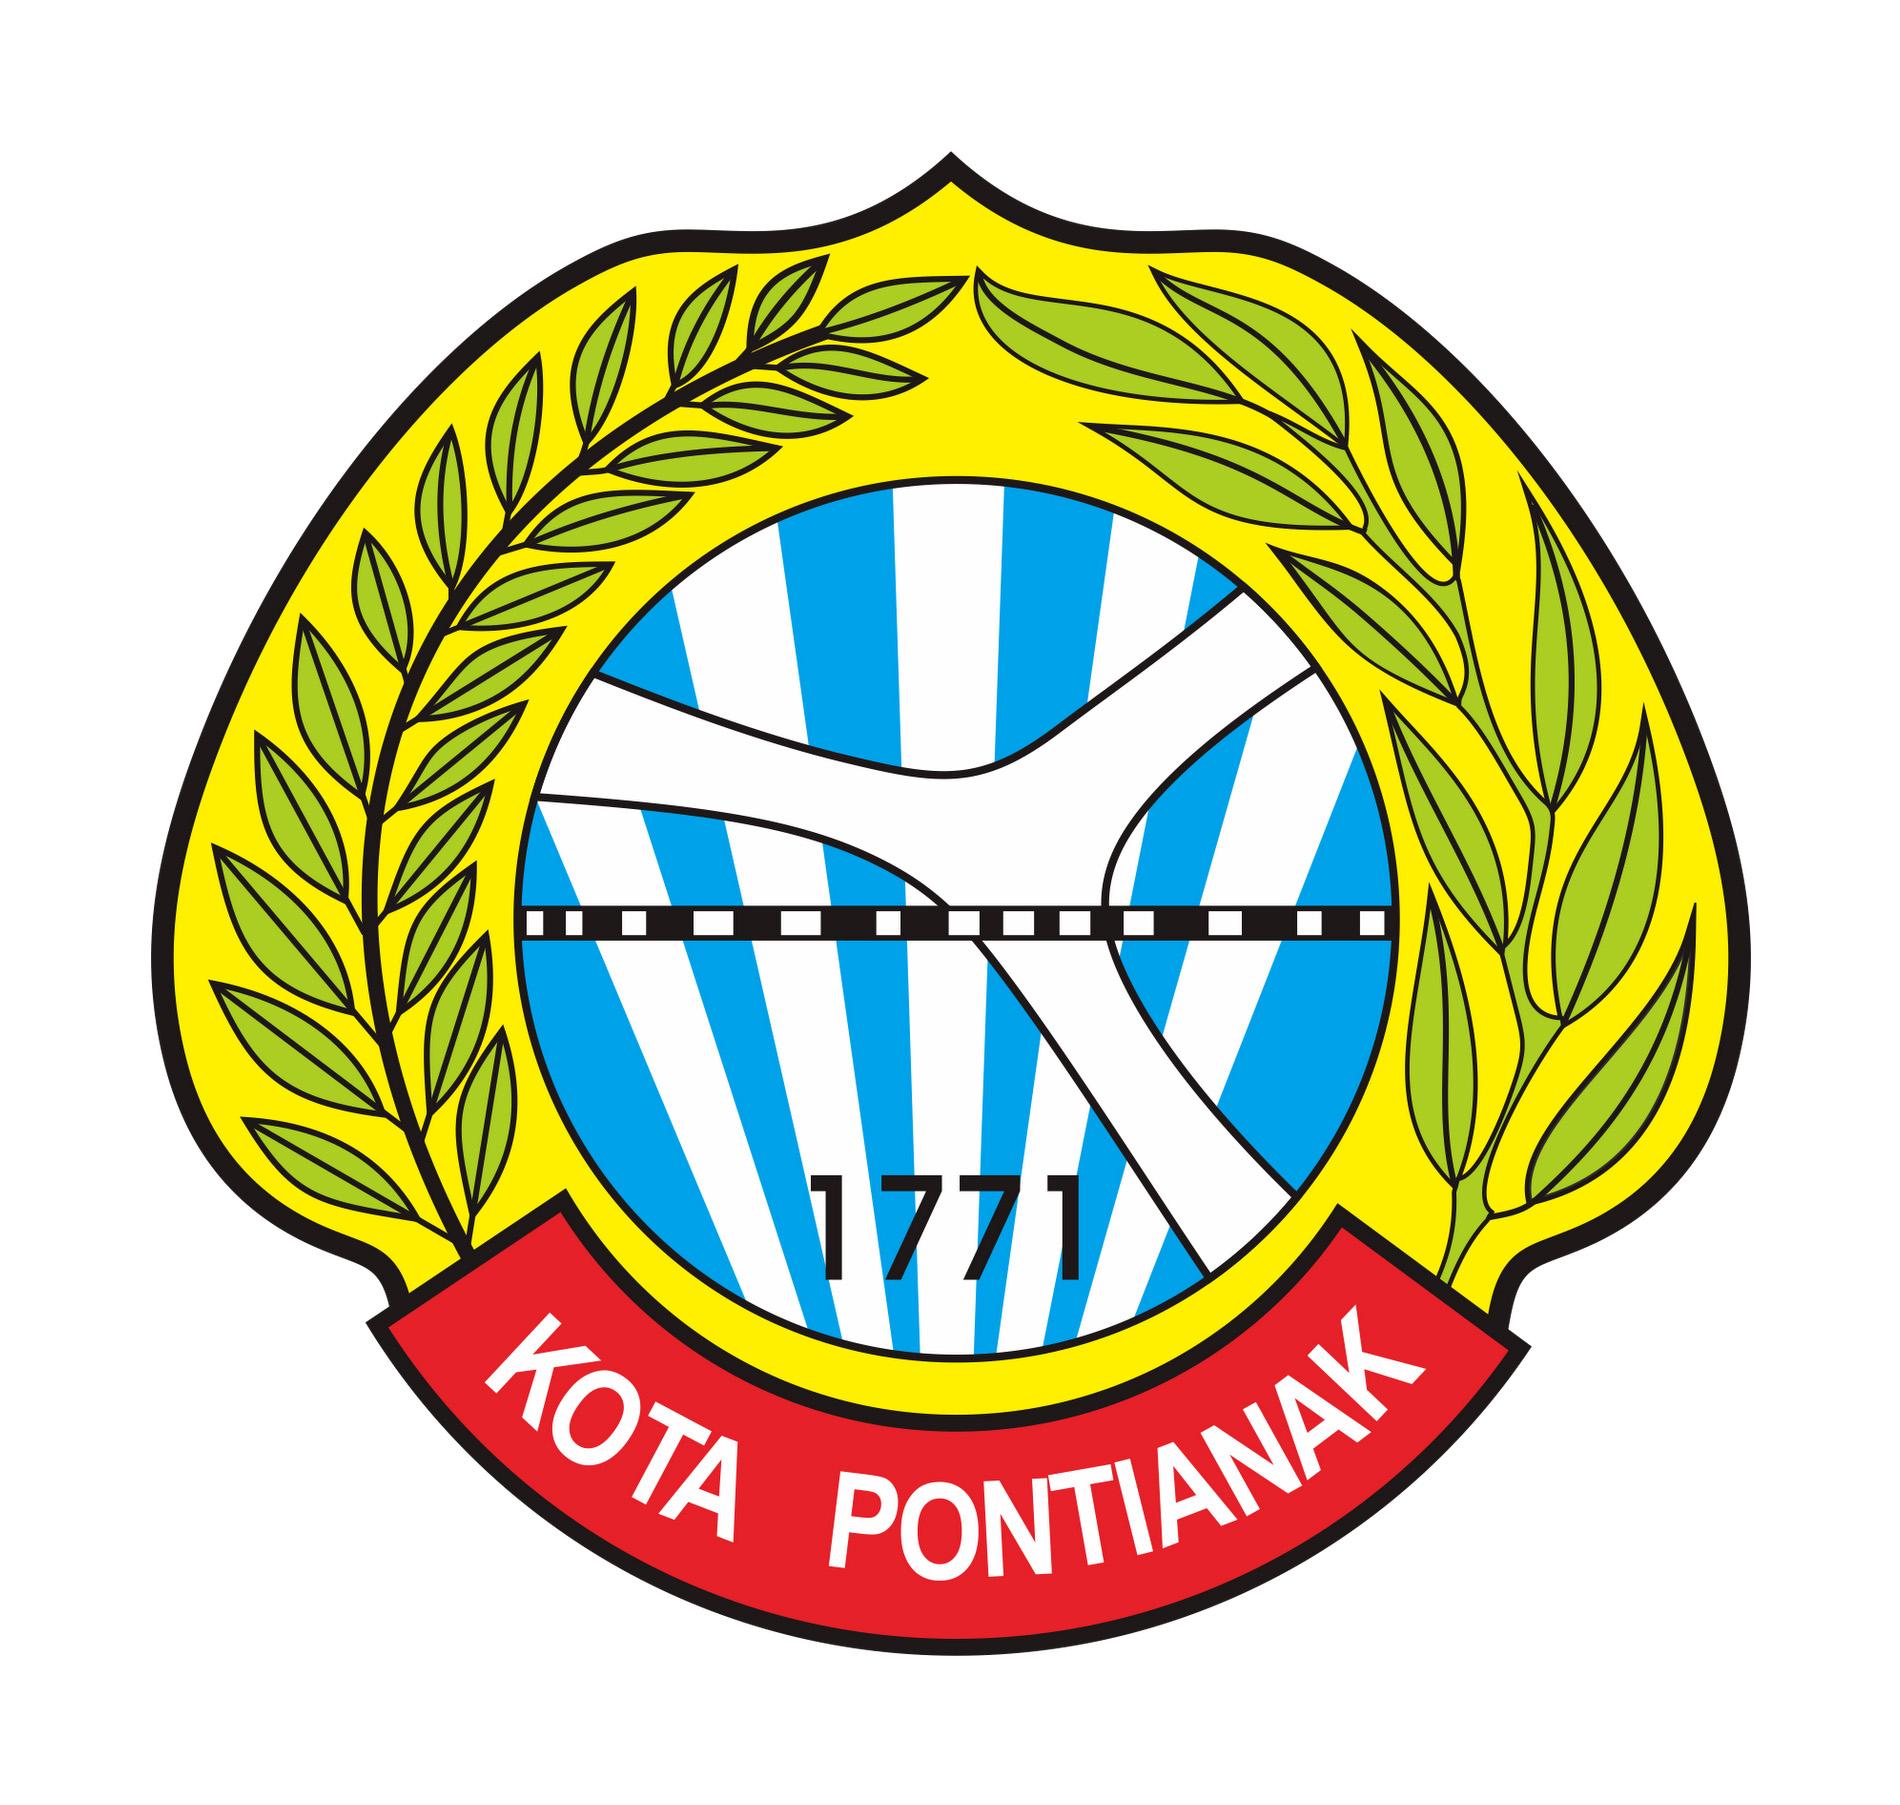 Logo Kota Pontianak (Provinsi Kalimantan Barat) Original